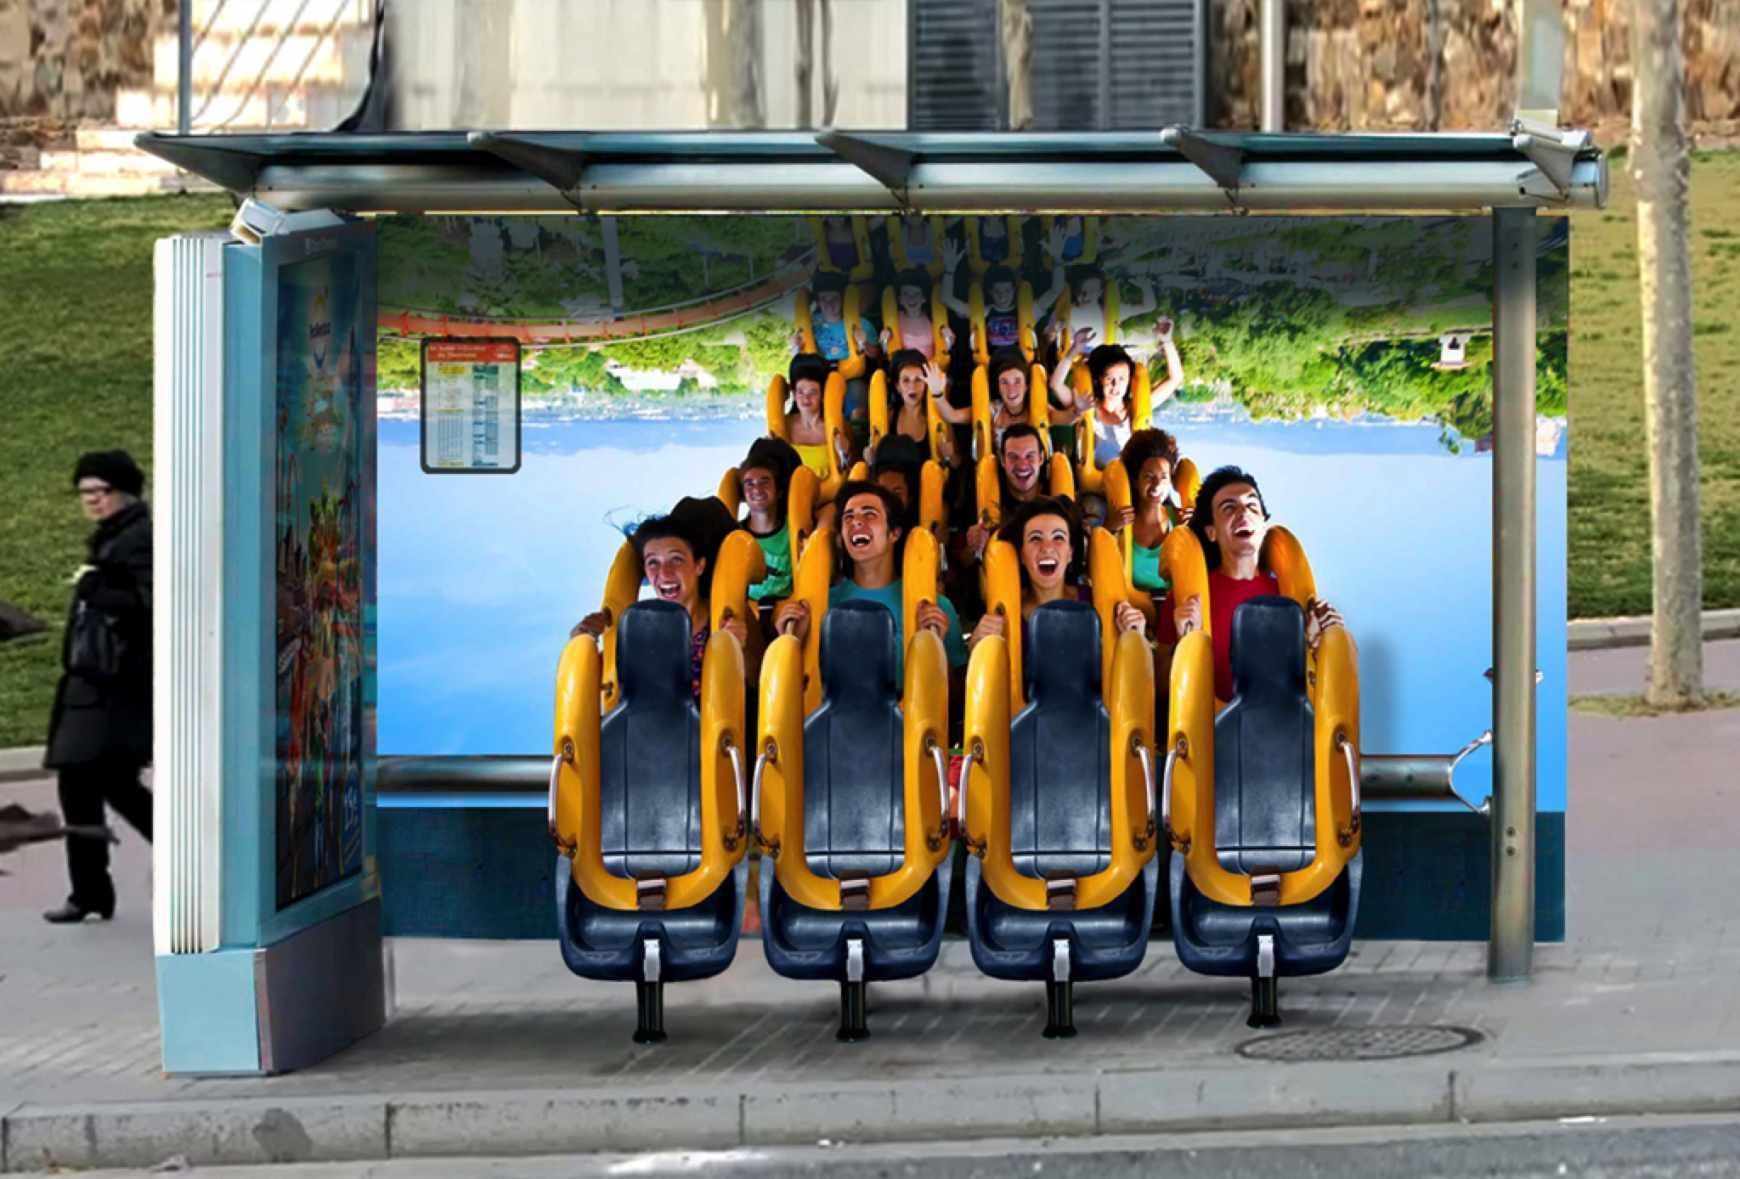 rollercoaster_aotw_0.jpg